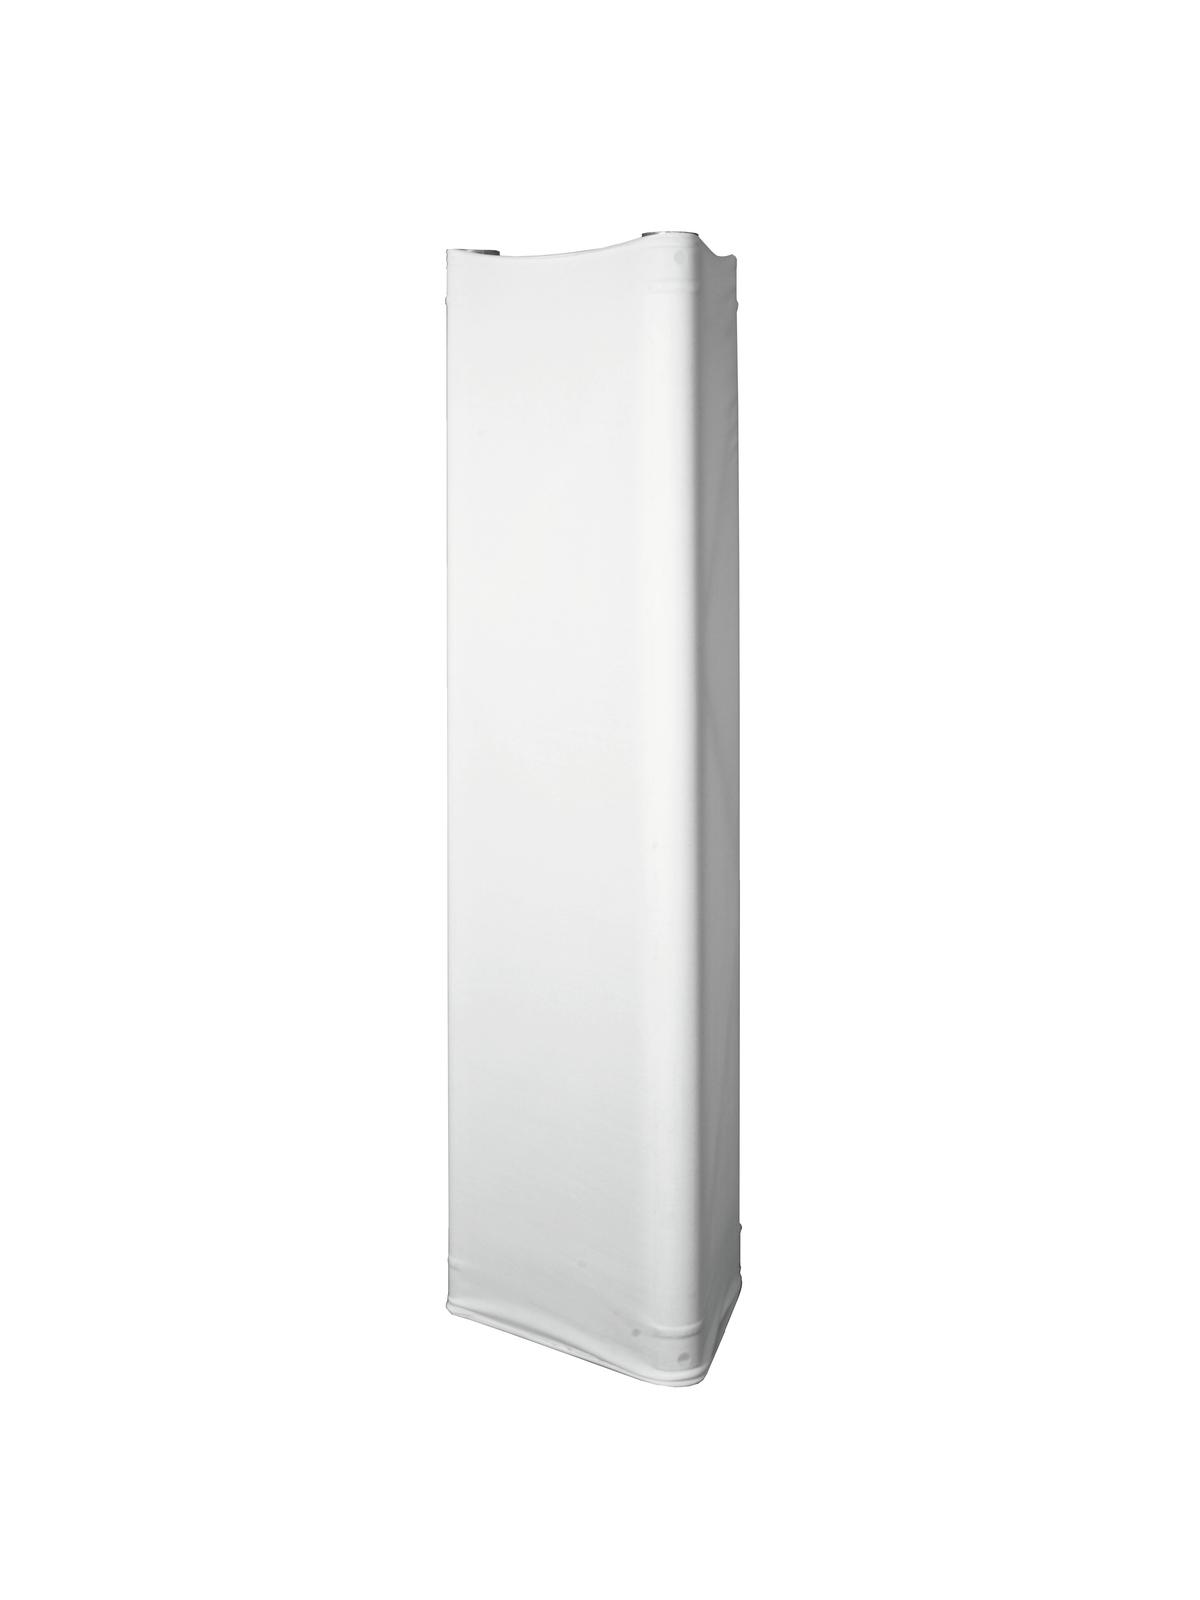 EXPAND BATC2W Trusscover 200cm weiß